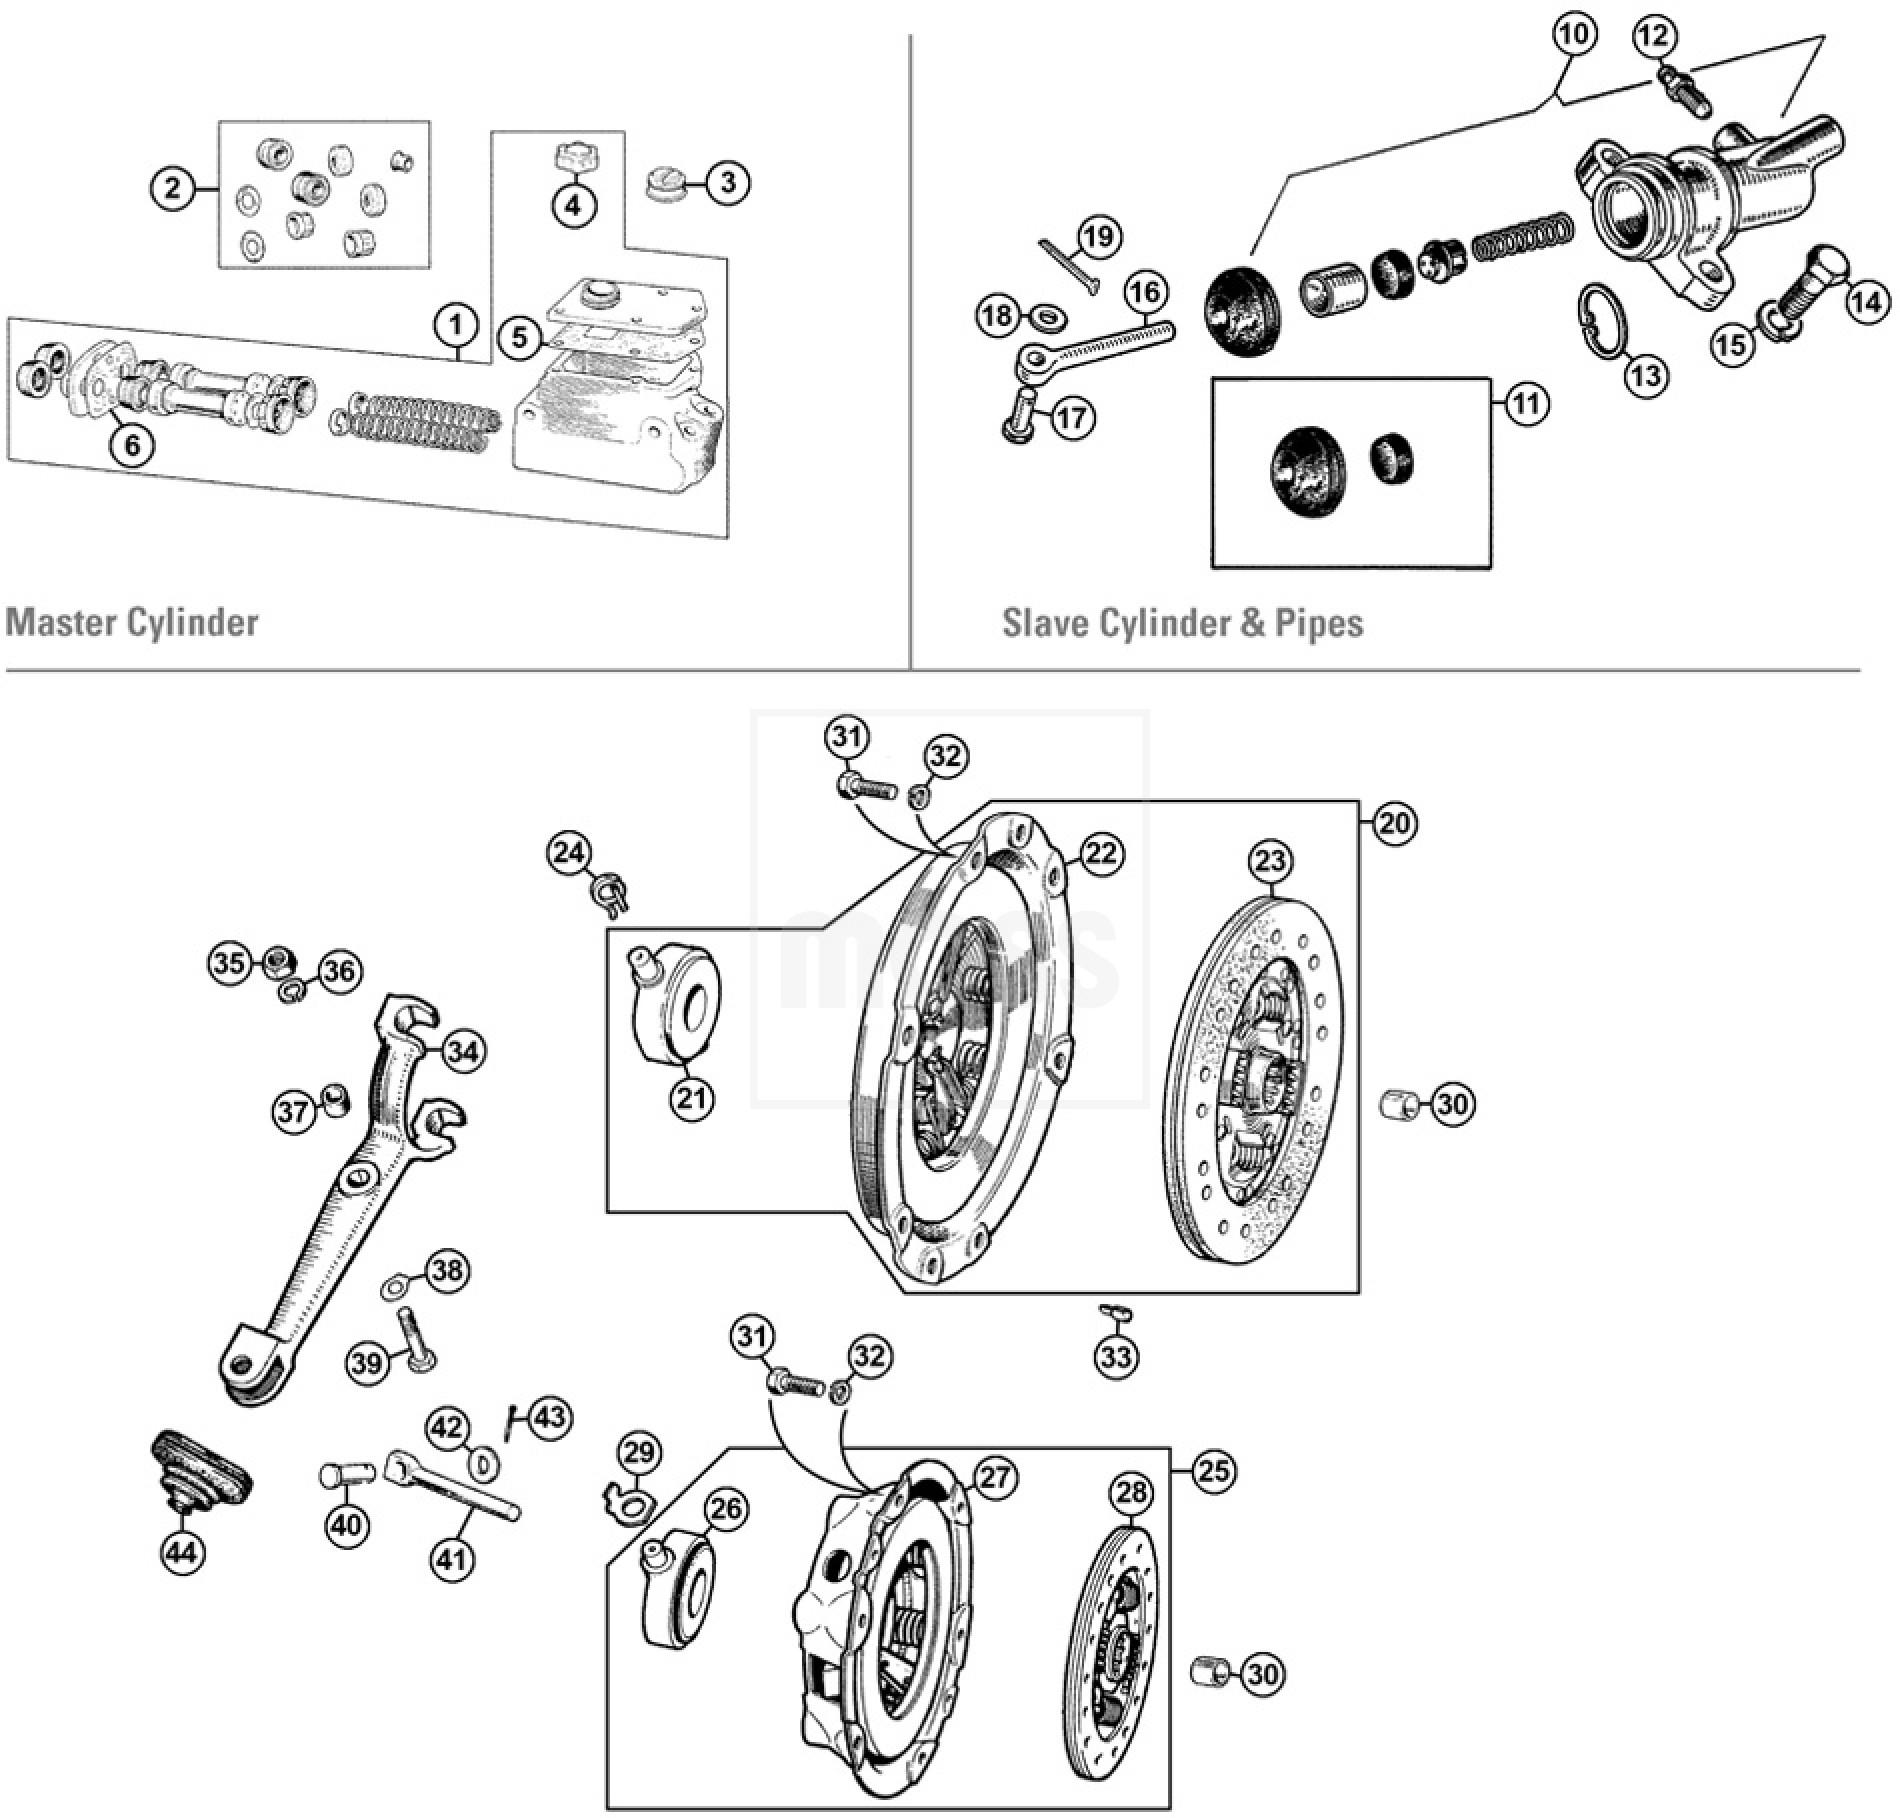 triumph spitfire transmission sh3 me Simple Engine Diagram Engine Diagram with Labels